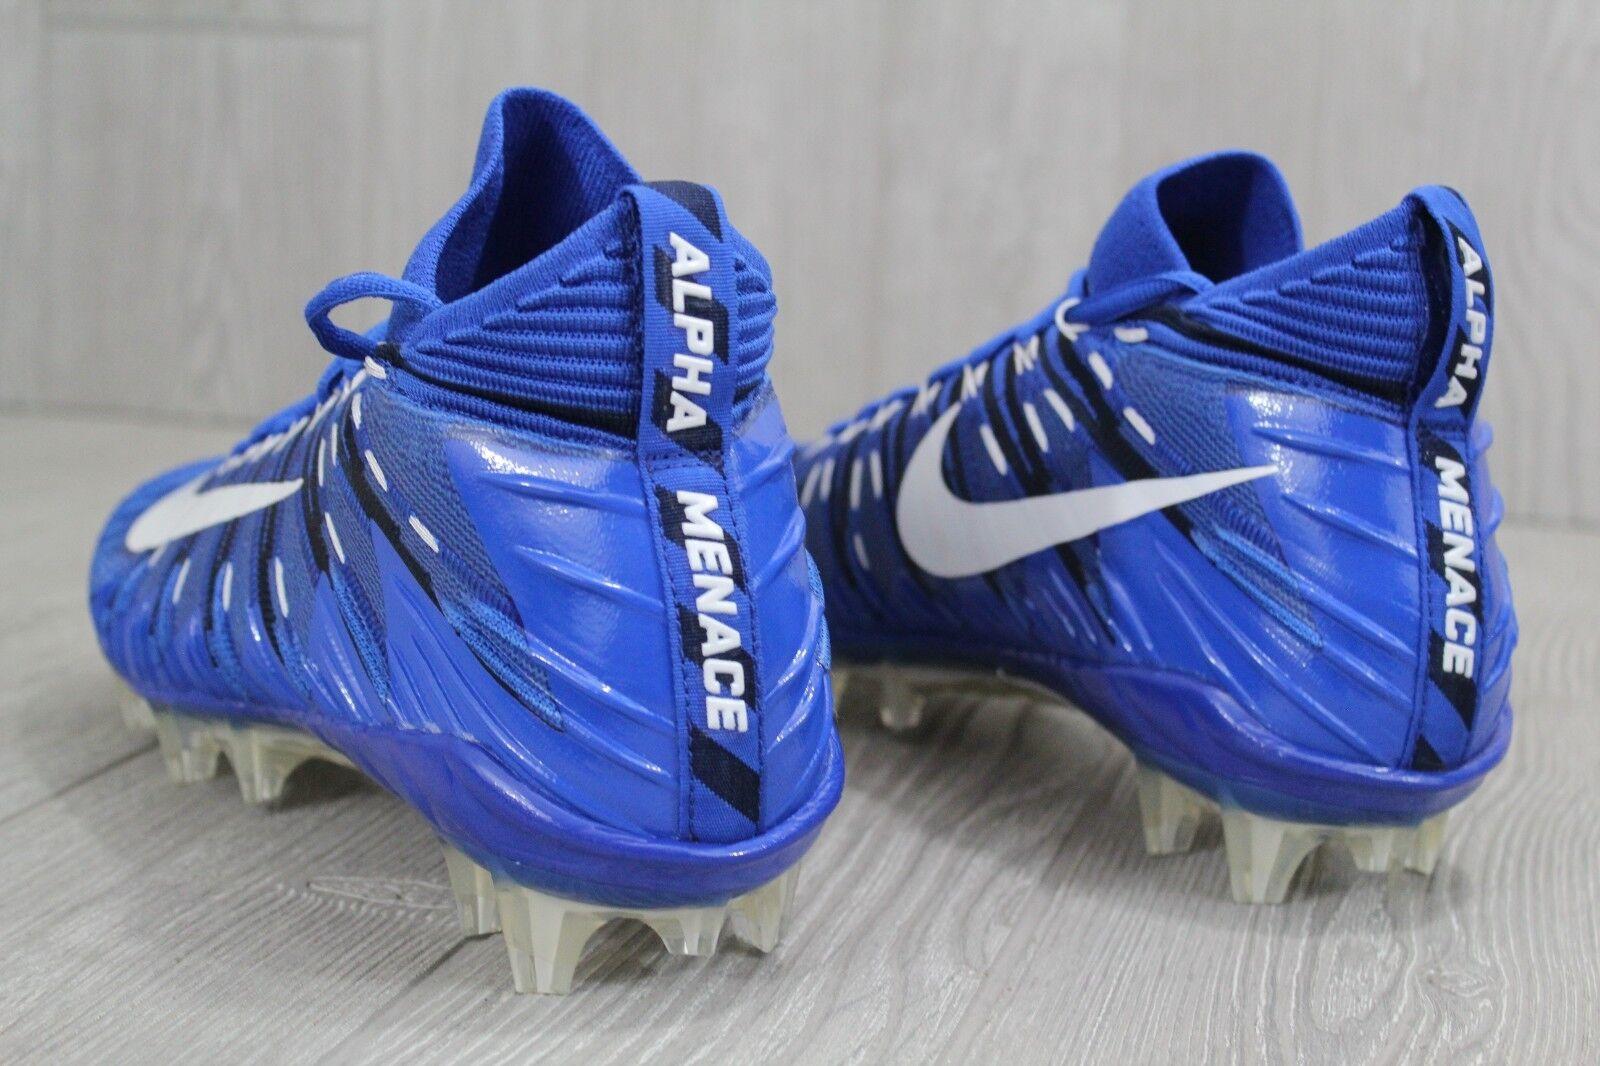 30 nuove nike alfa minaccia minaccia minaccia elite football scarpette spuntoni blu - bianco 871519-414 9 - 13 | Uscita  e3ca69